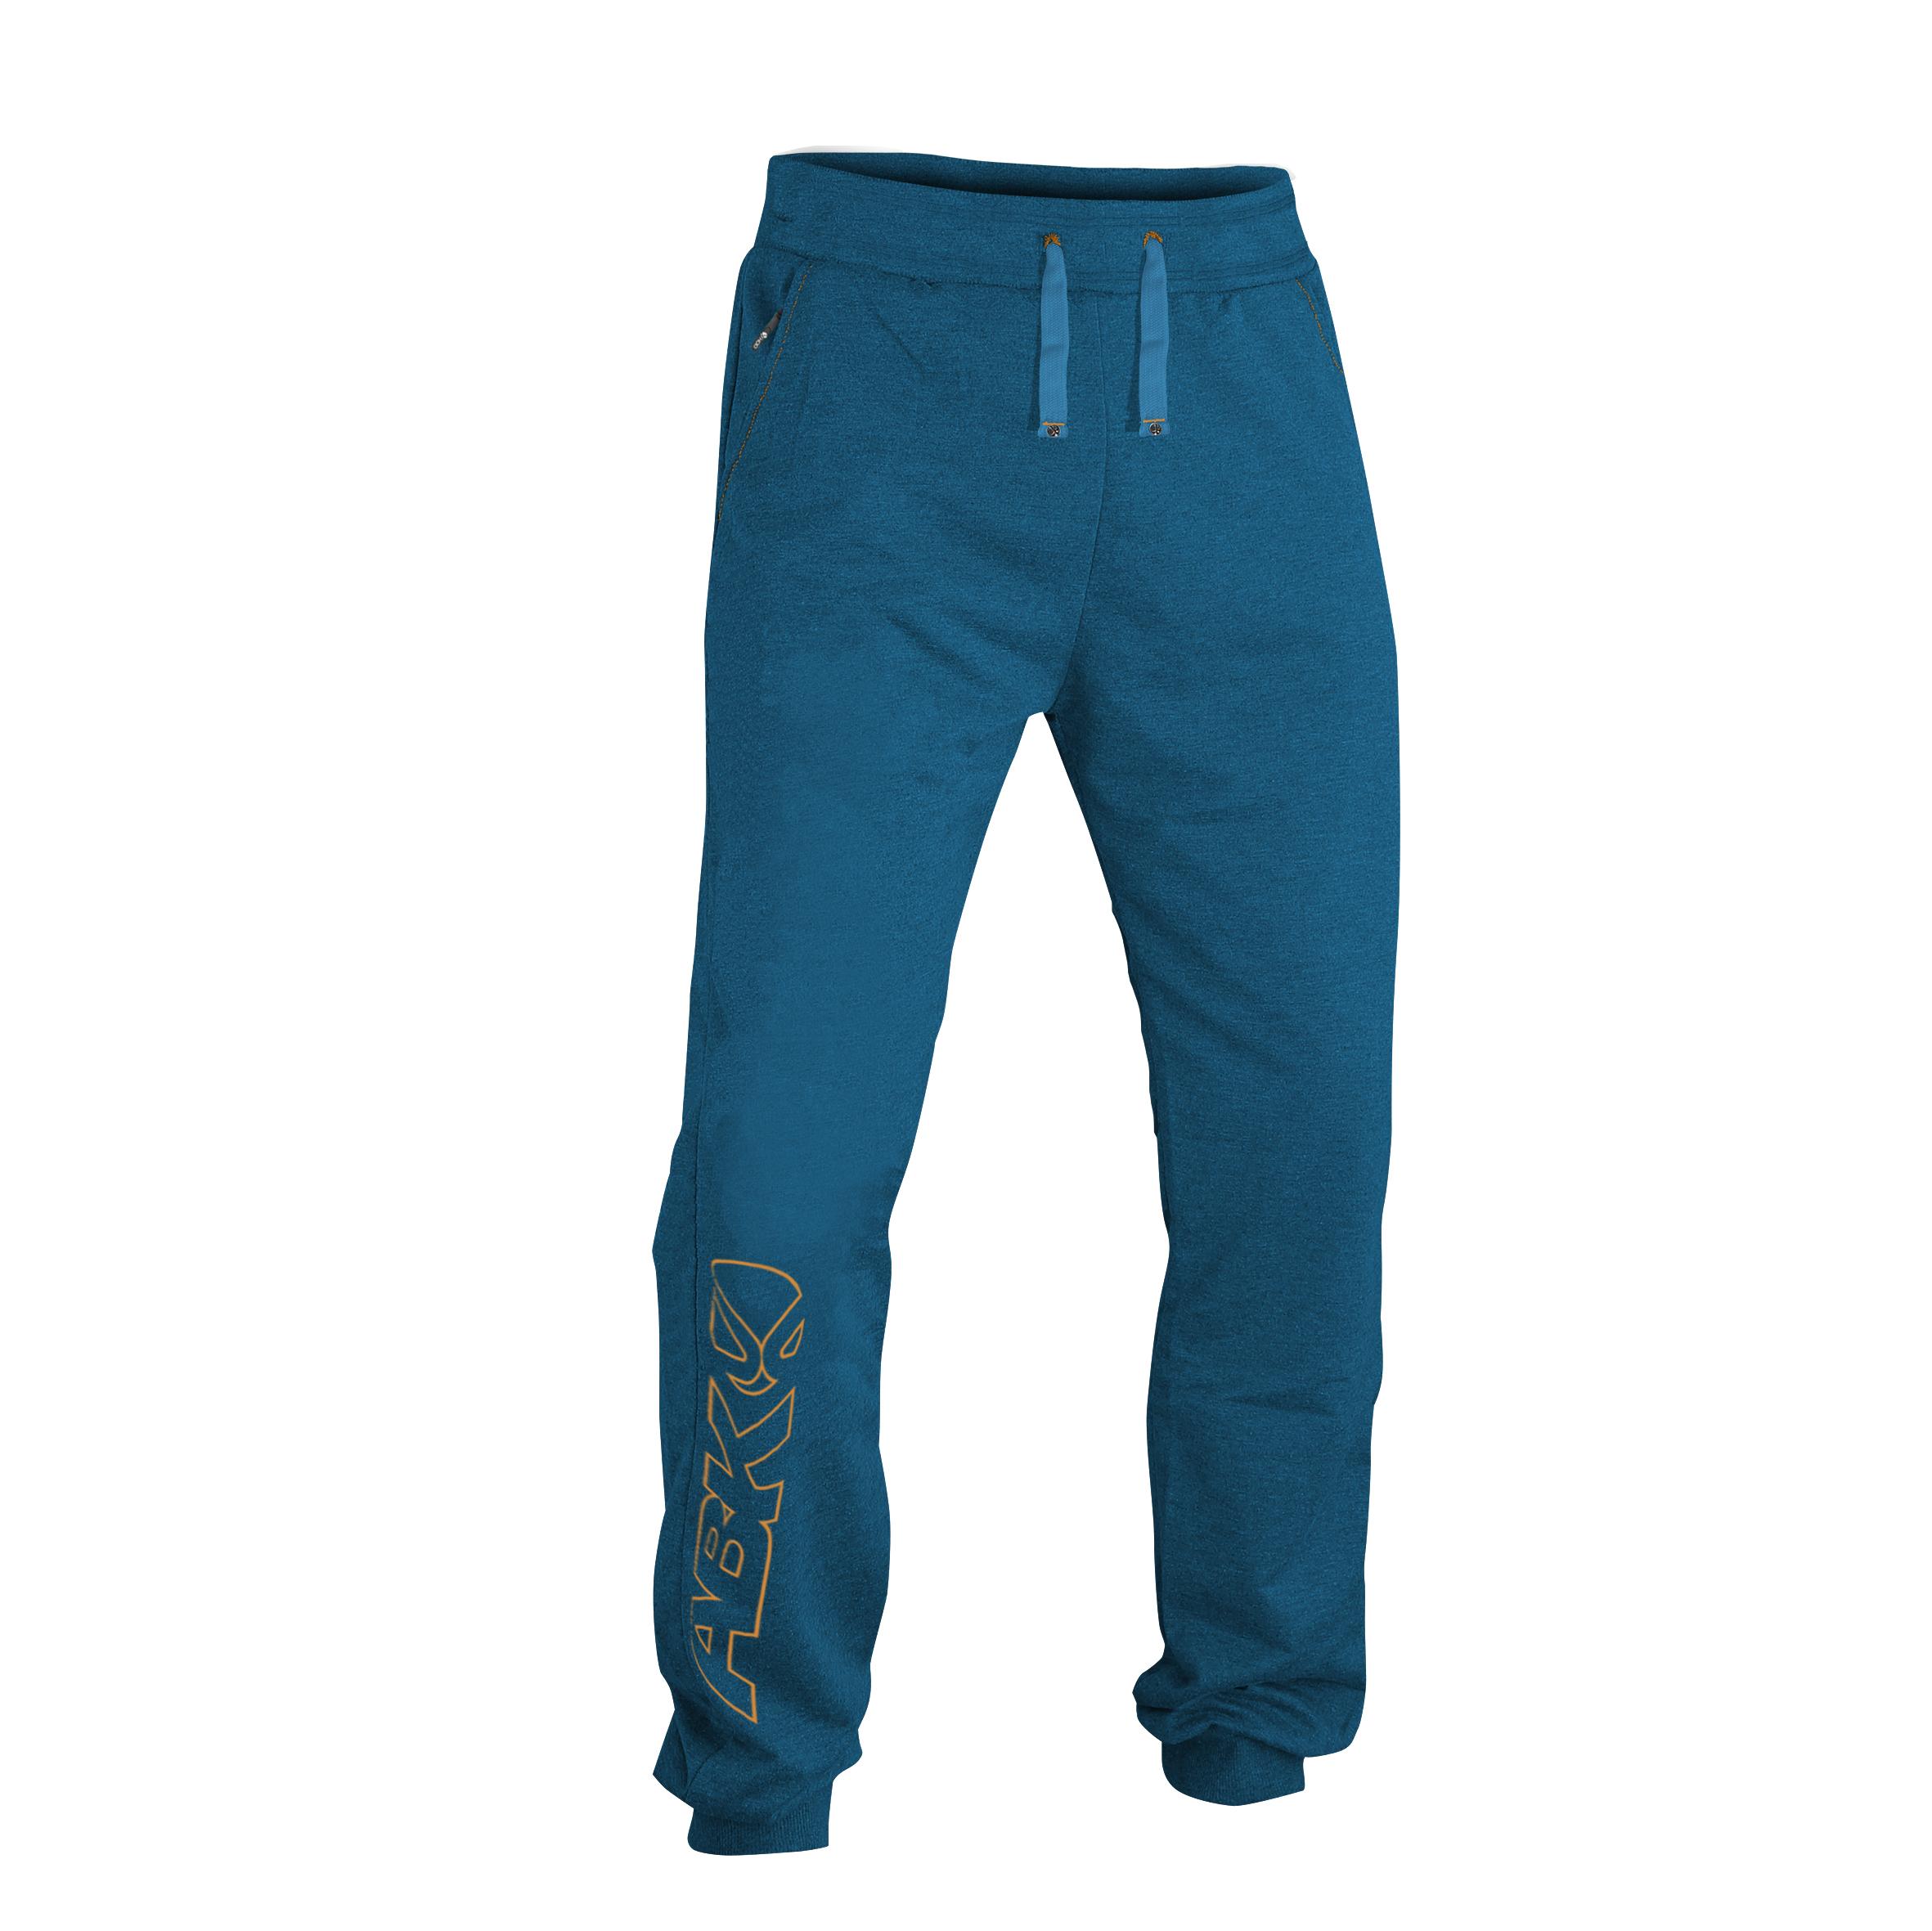 Abk company pant lazy. Jeans clipart green pants